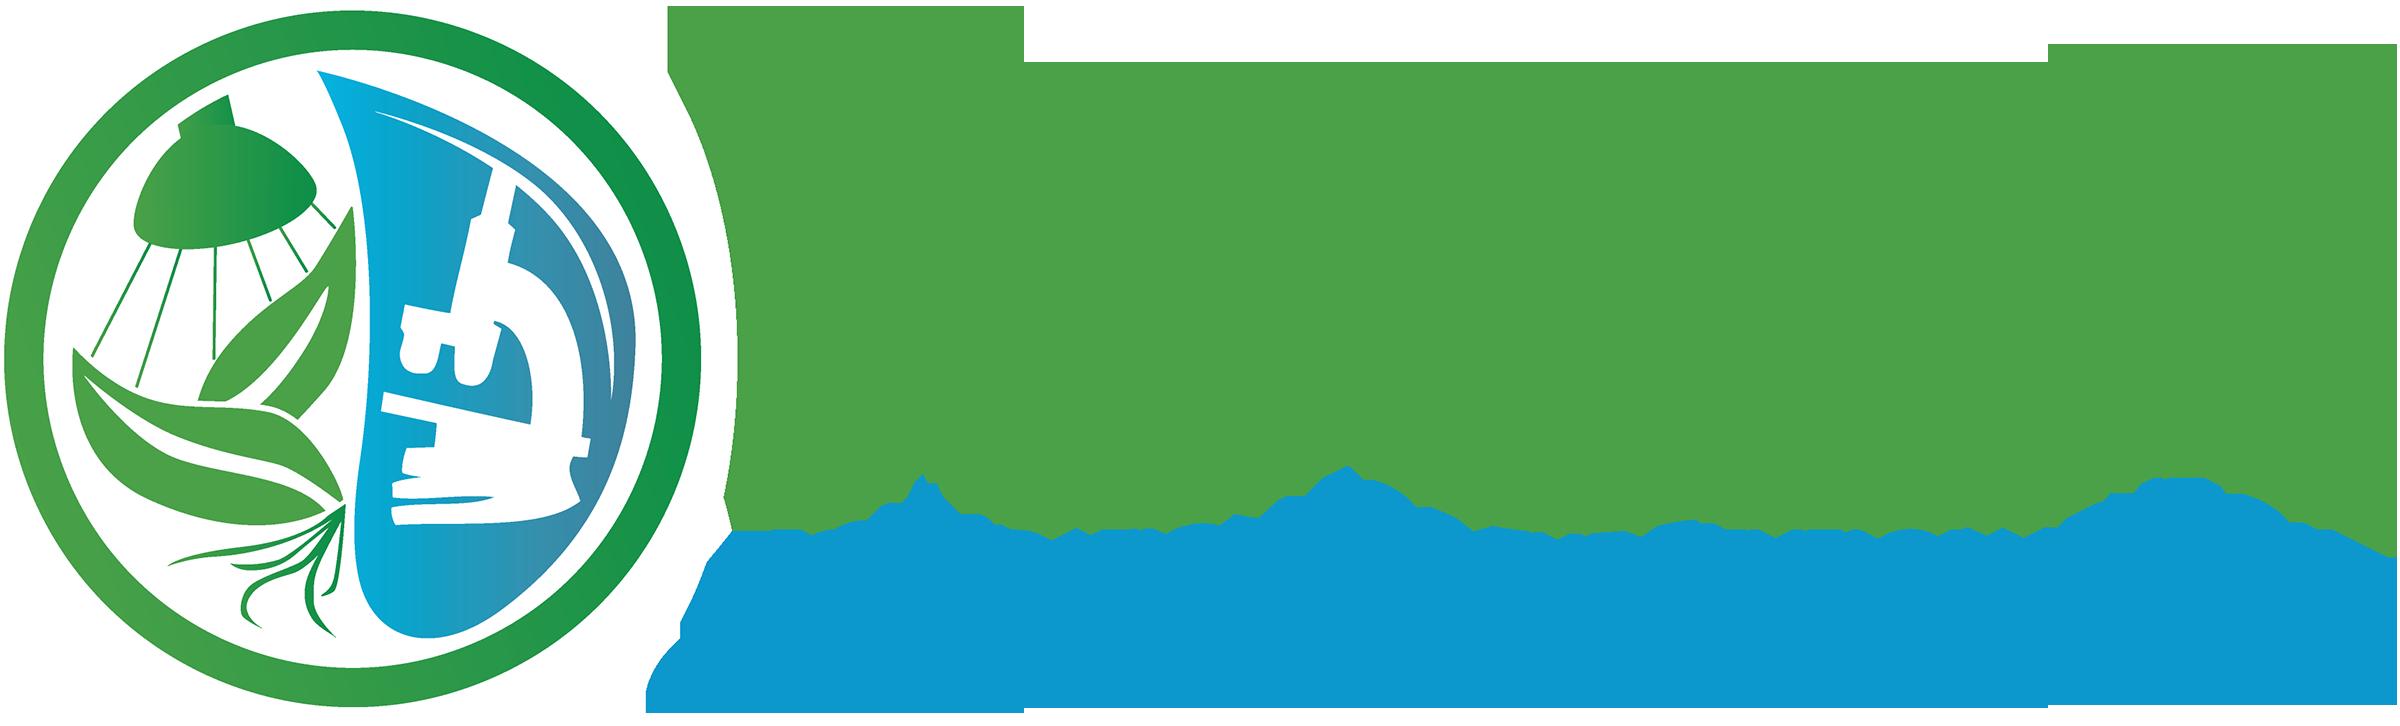 FDCEA logo.png